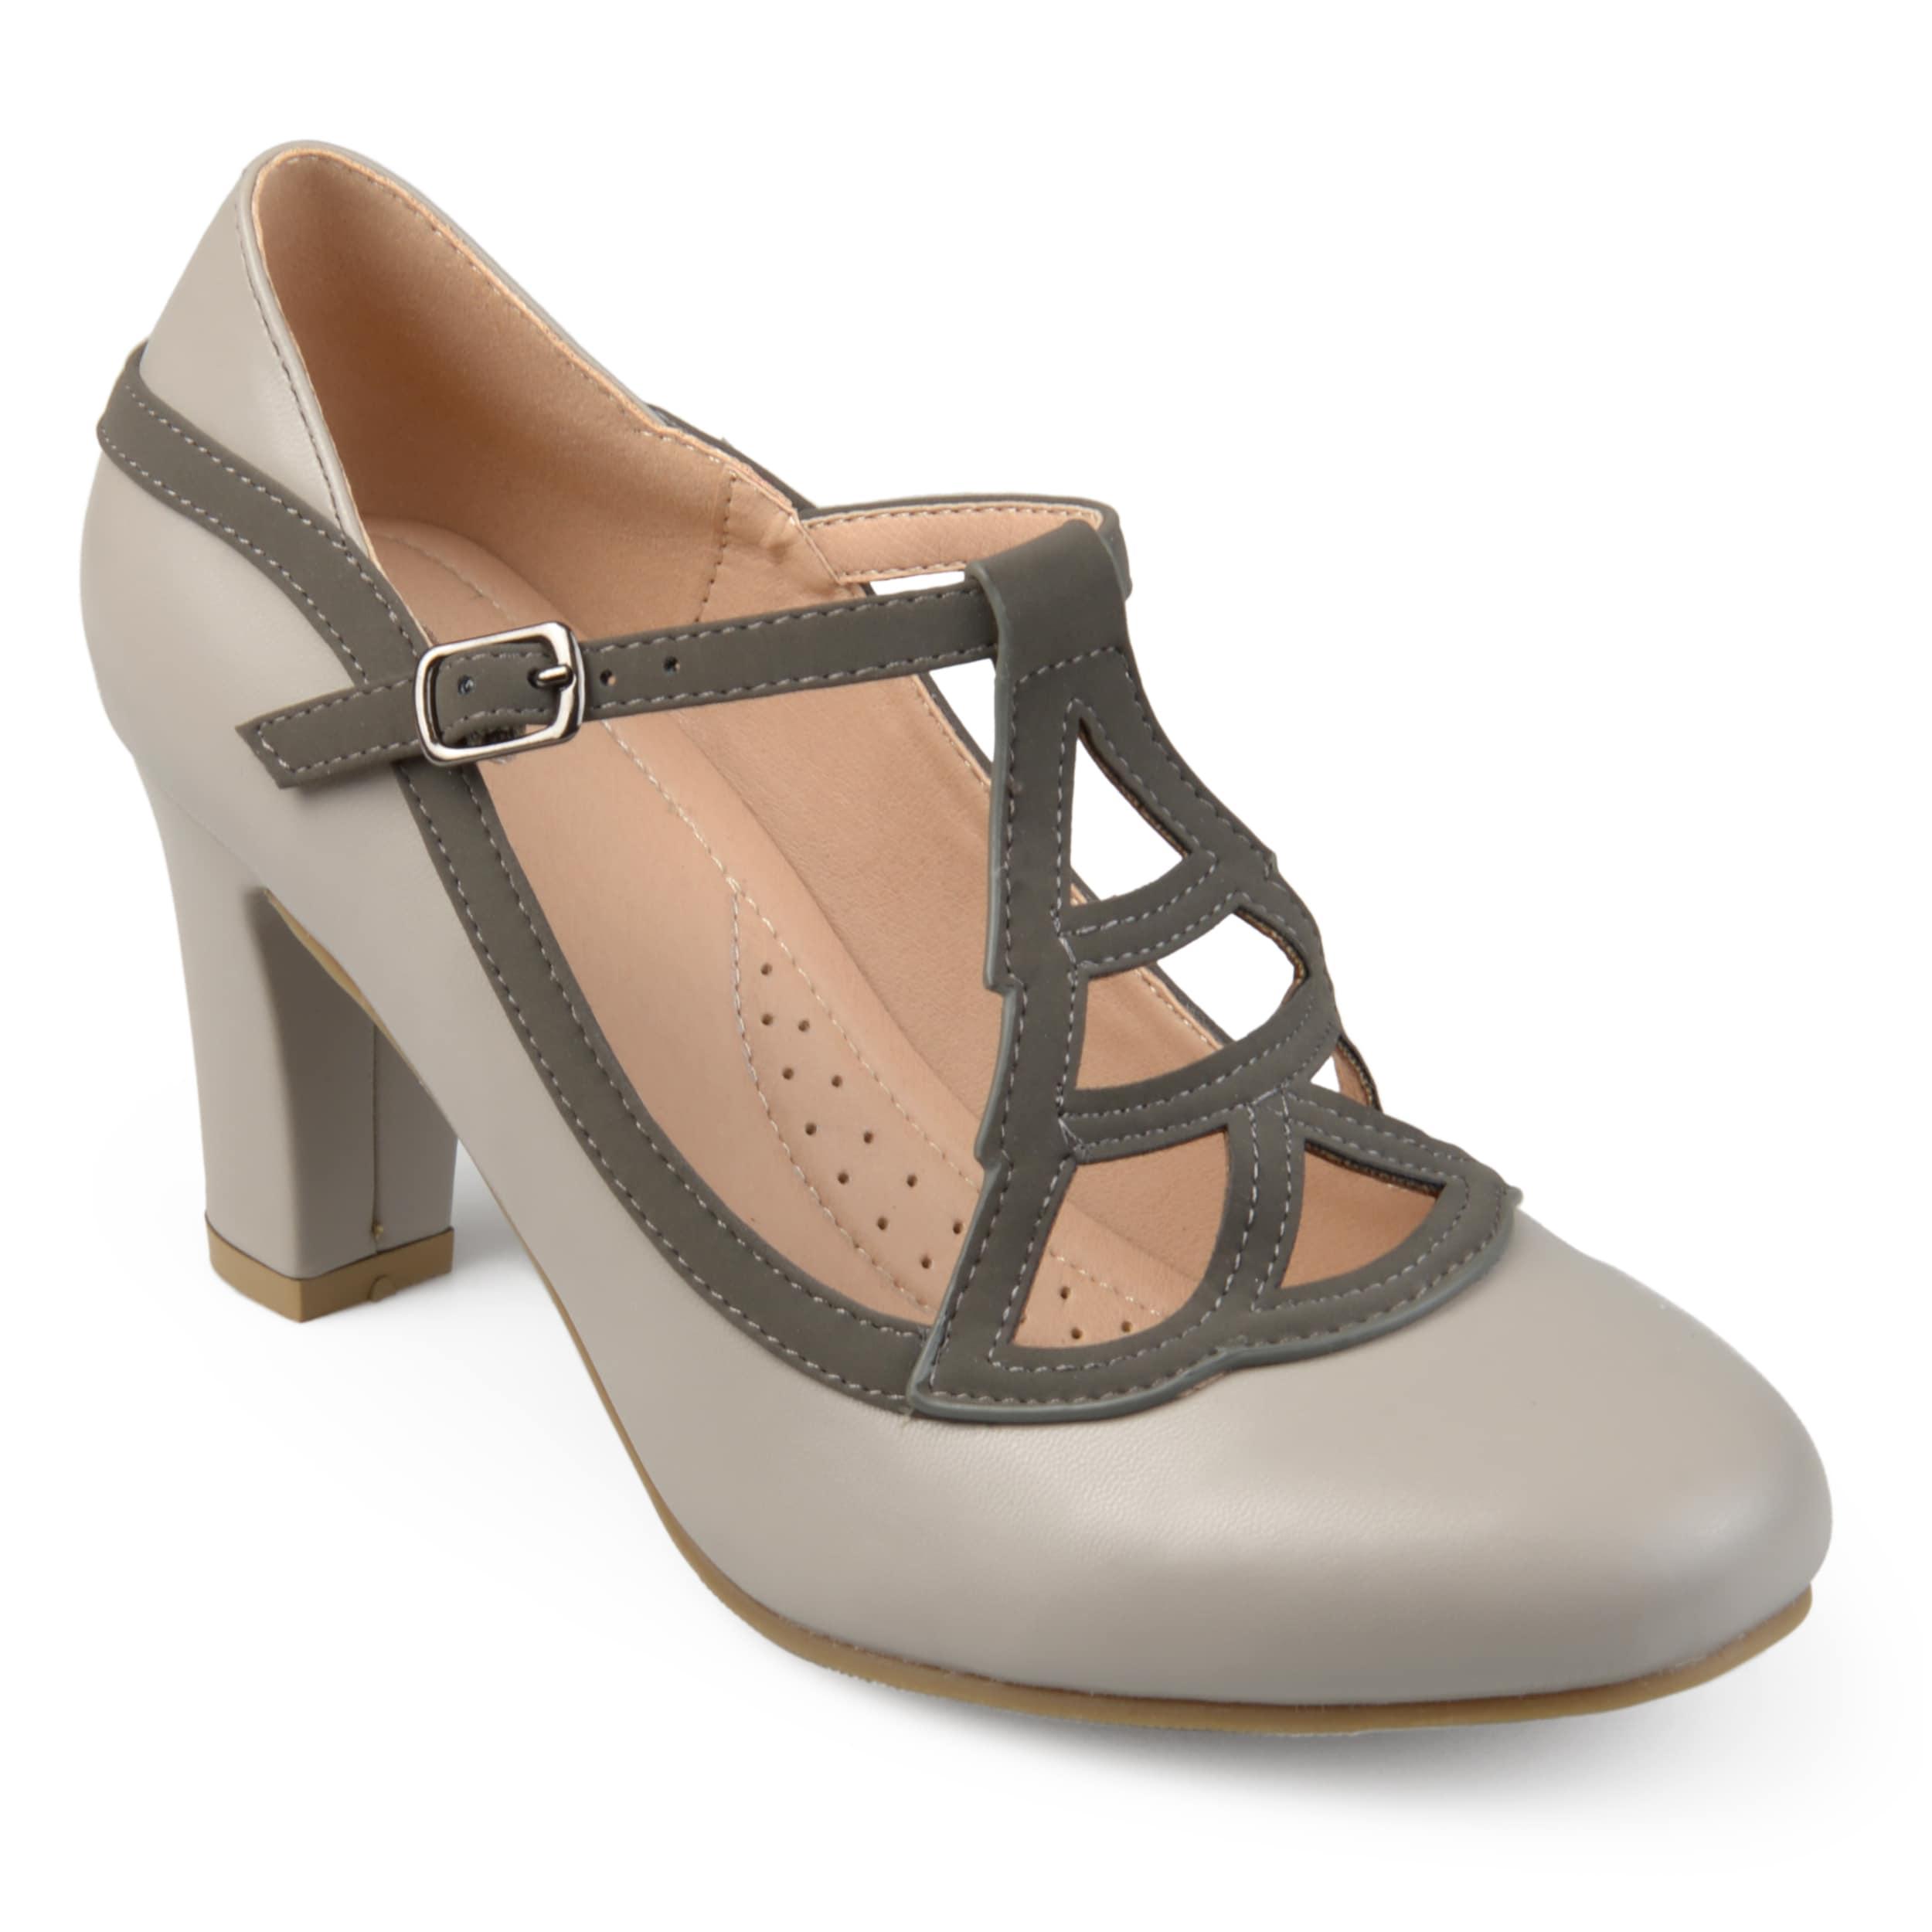 dea7f0d6edf Journee Collection Women s  Nile  Round-toe Vintage Comfort-sole Two-tone  Lattice Mary Jane Pumps